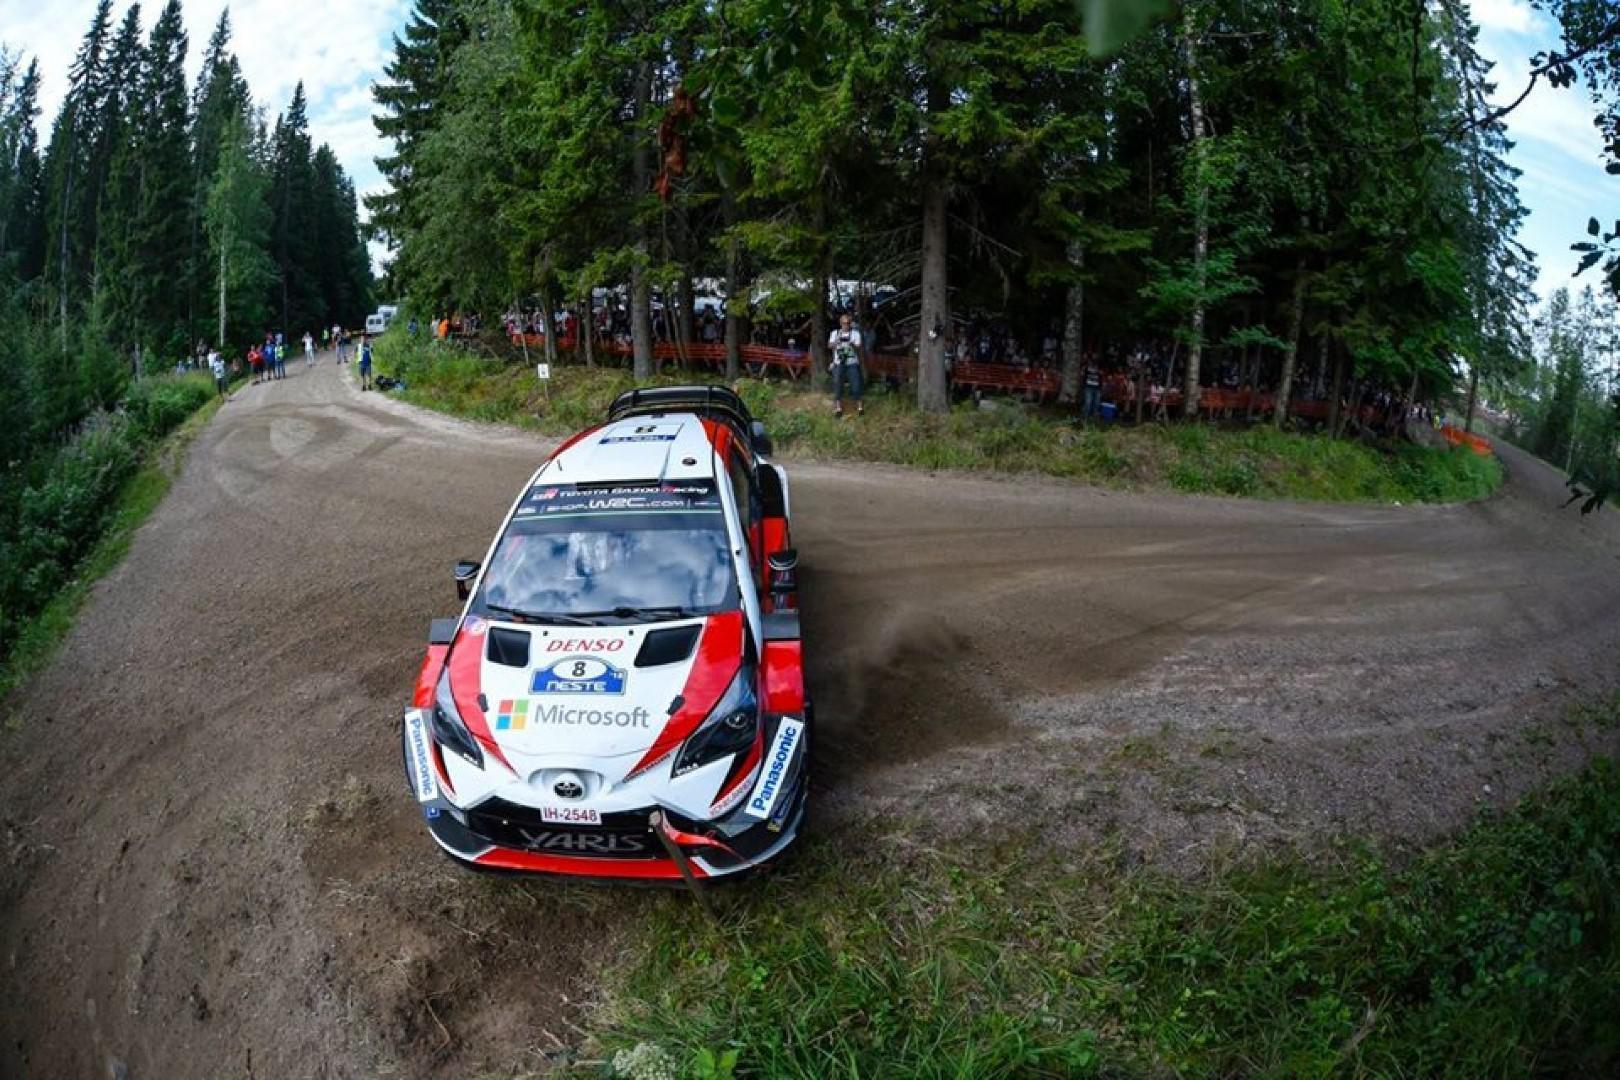 Rallye de Finlande 2018 : Ott Tanak leader